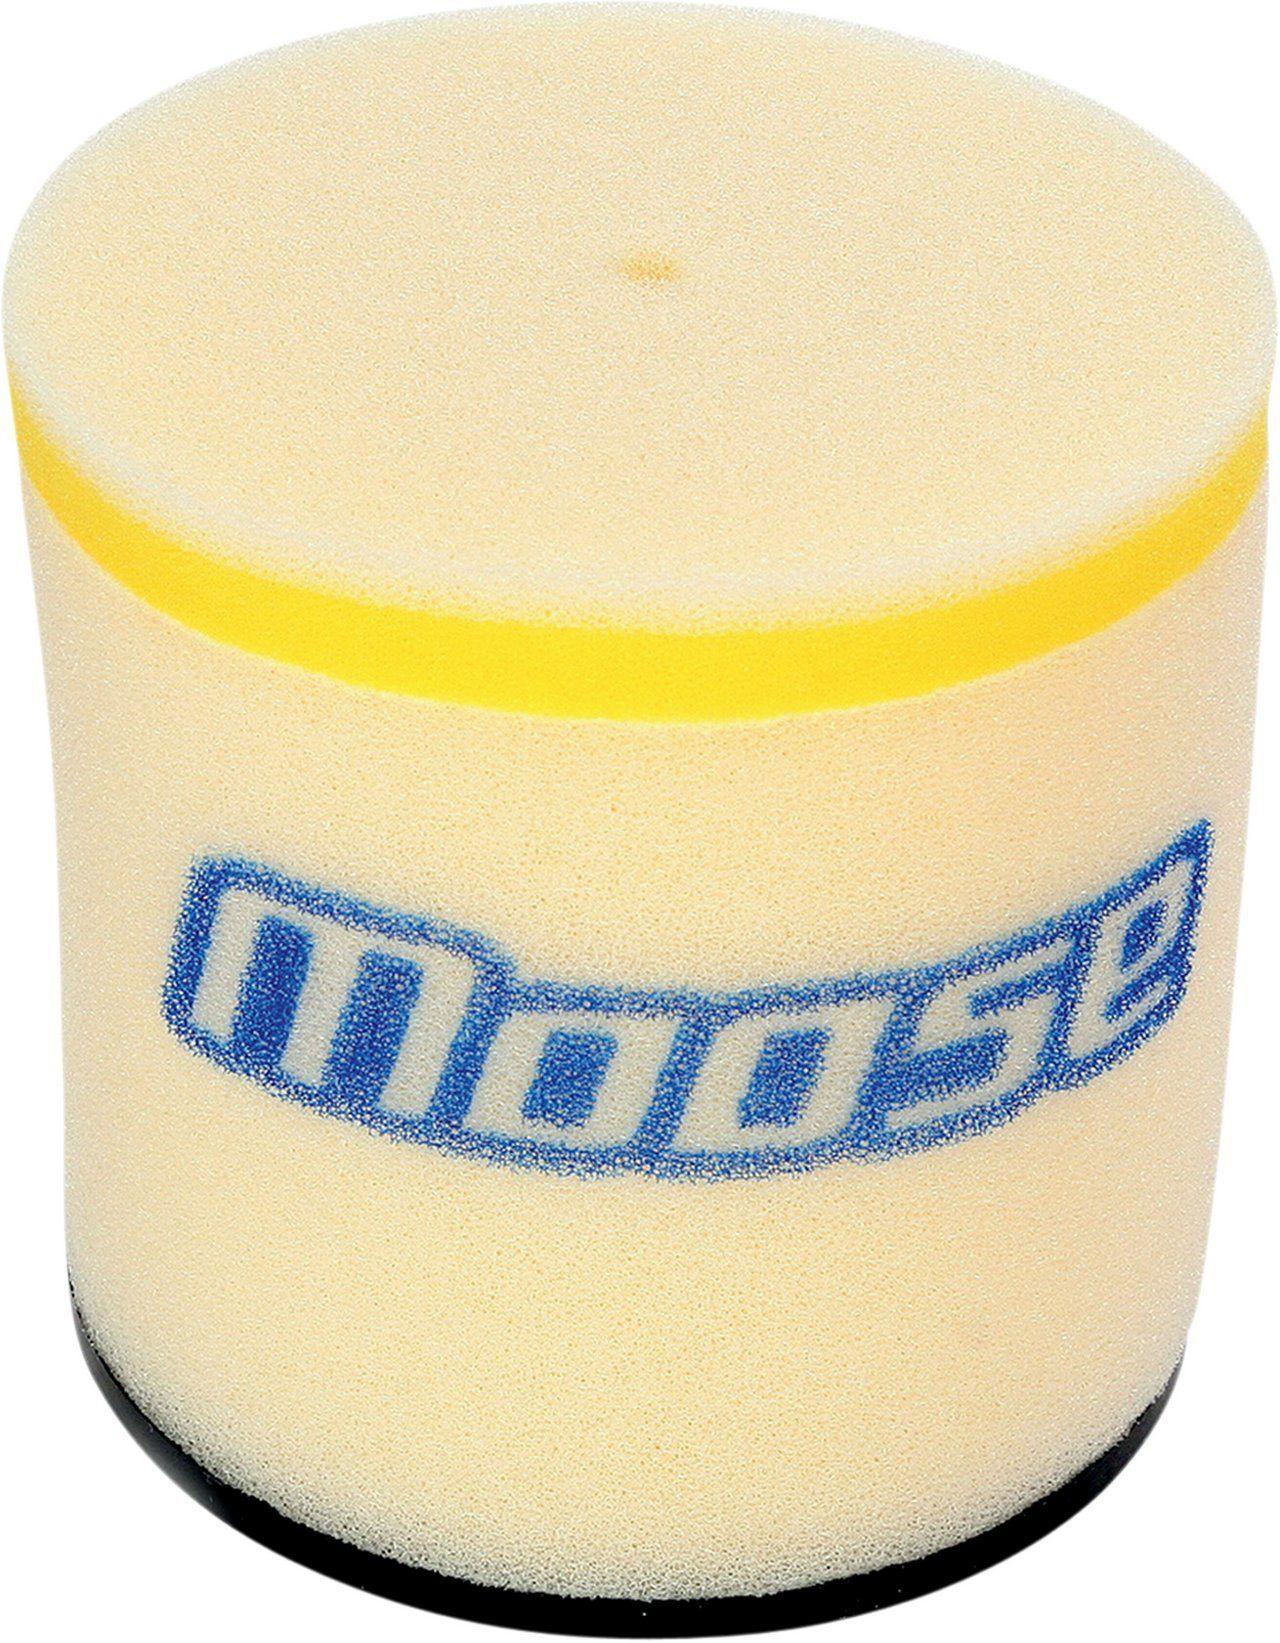 【MOOSE RACING】PPO (PRECISION PRE-OILED) 空氣濾芯 [M763-20-17] - 「Webike-摩托百貨」